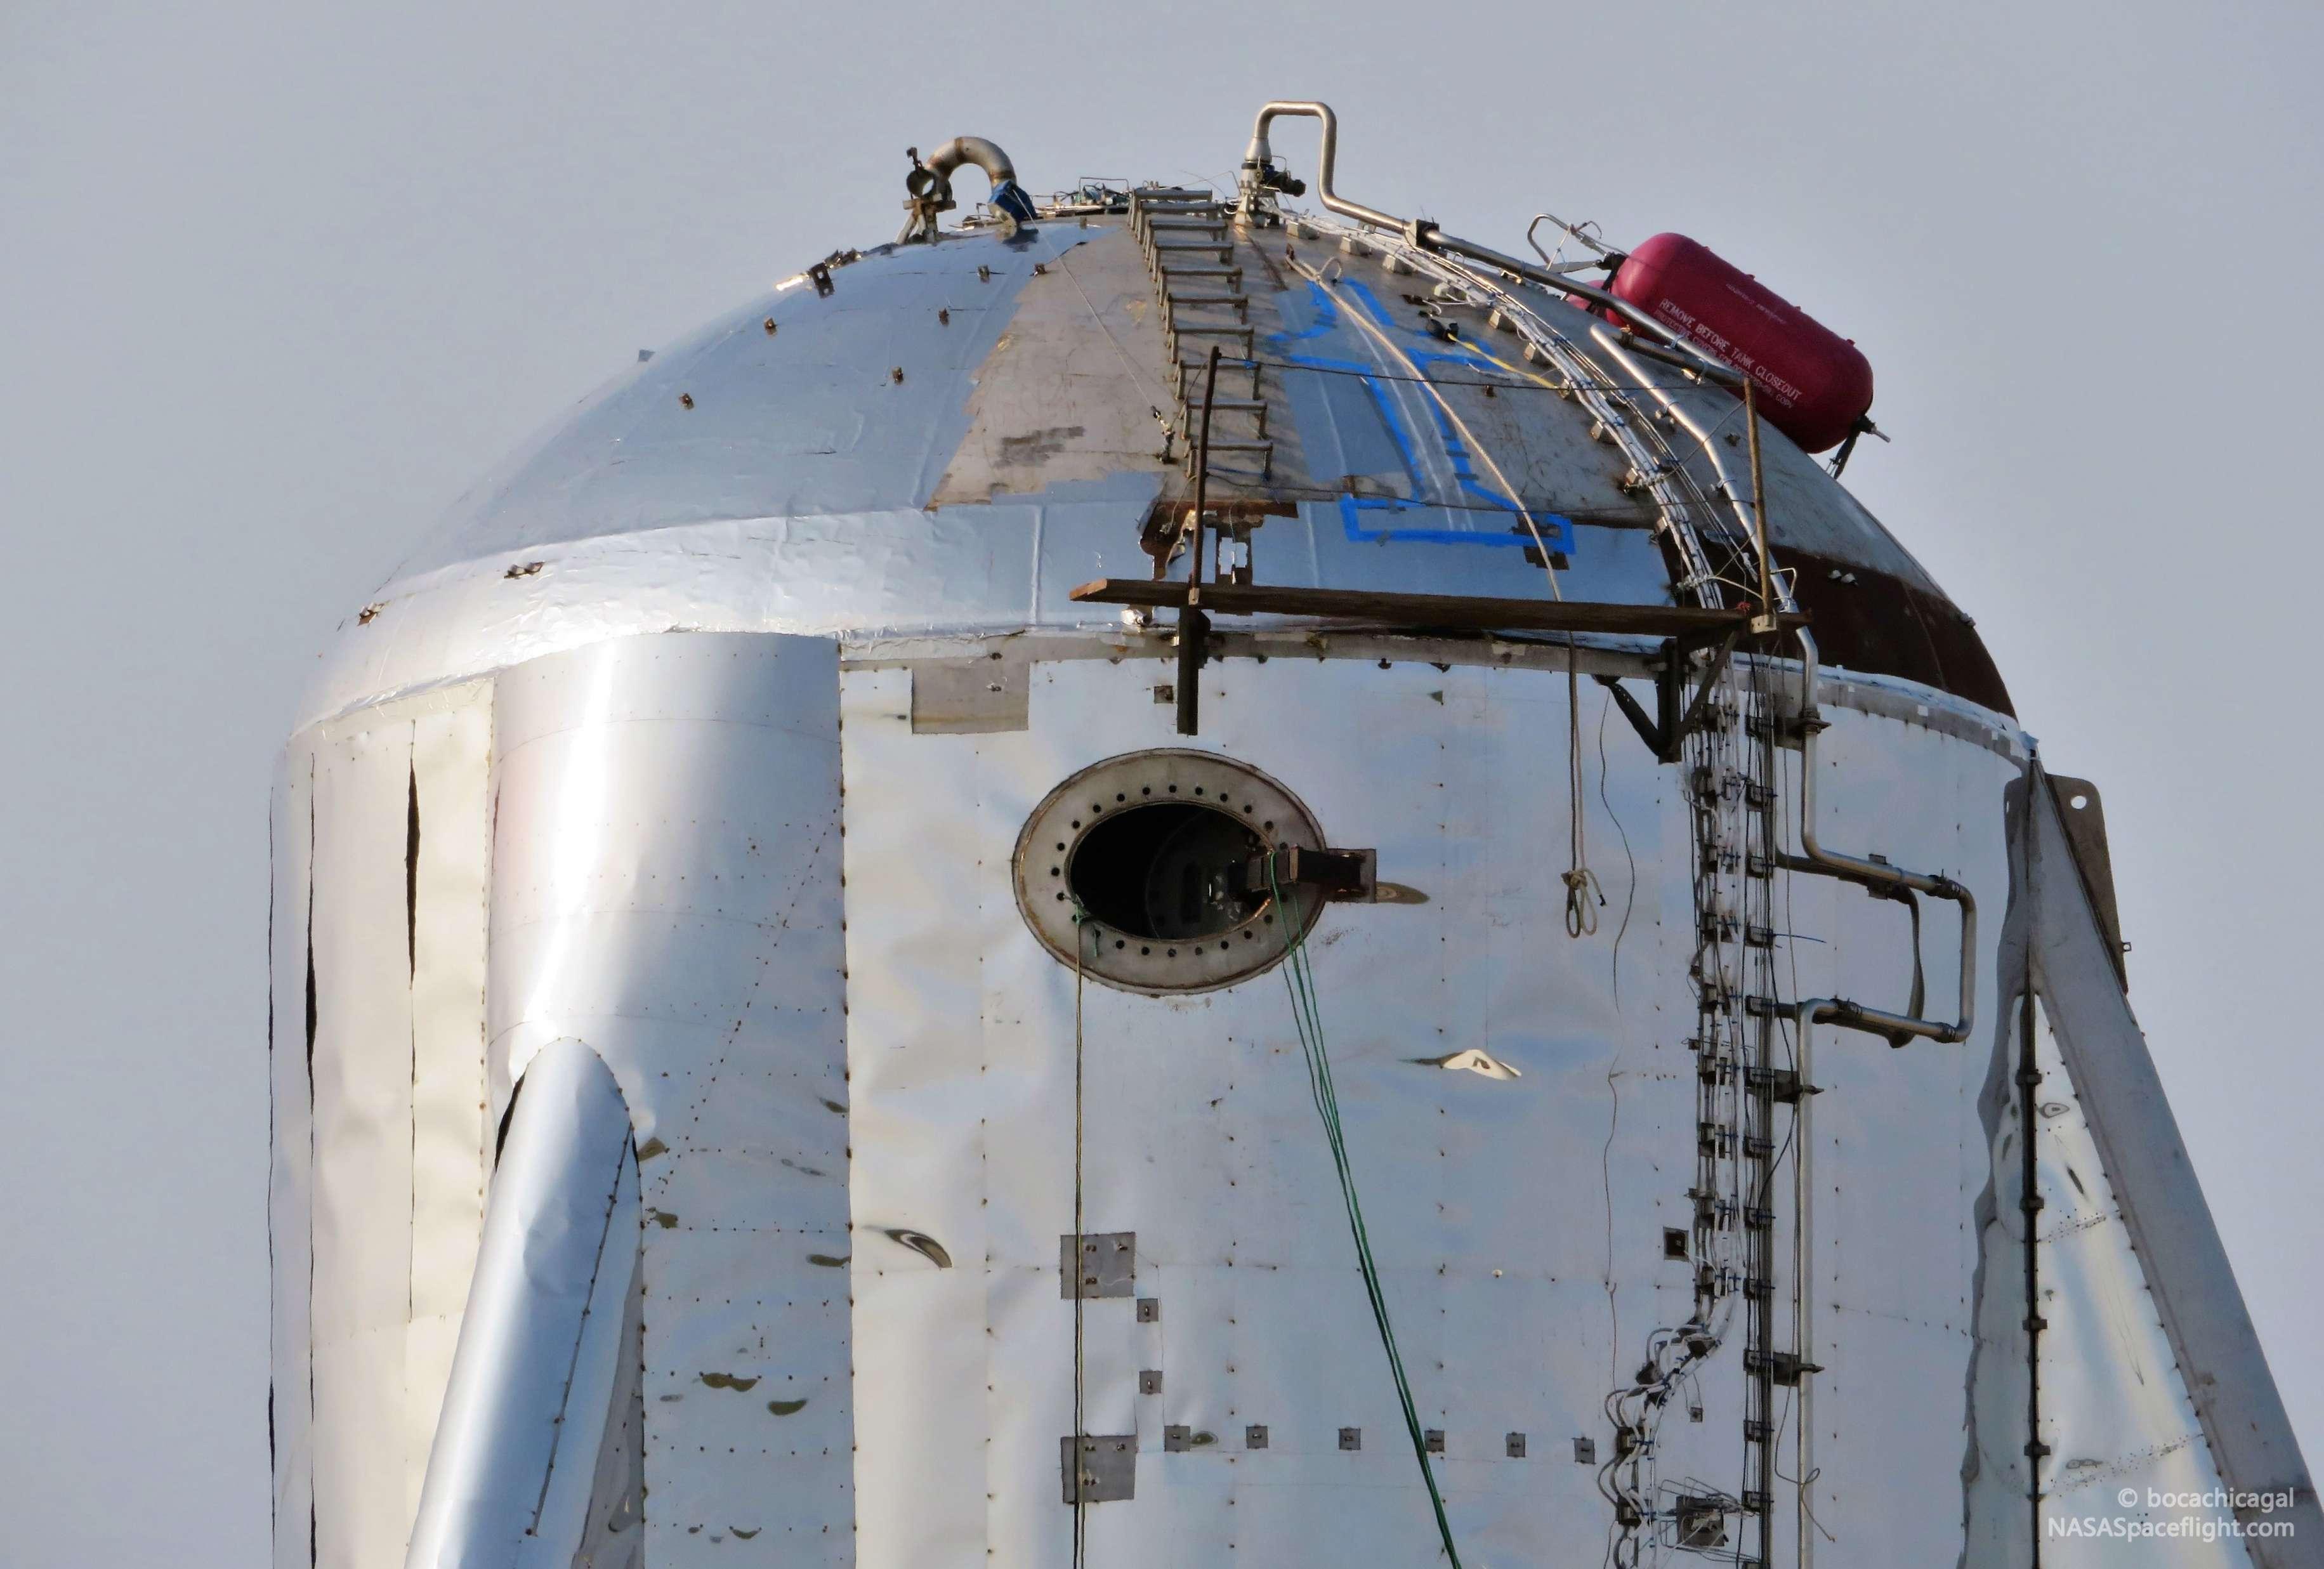 Boca Chica Starhopper pad progress 050519 (NASASpaceflight – bocachicagal) 2 (c)